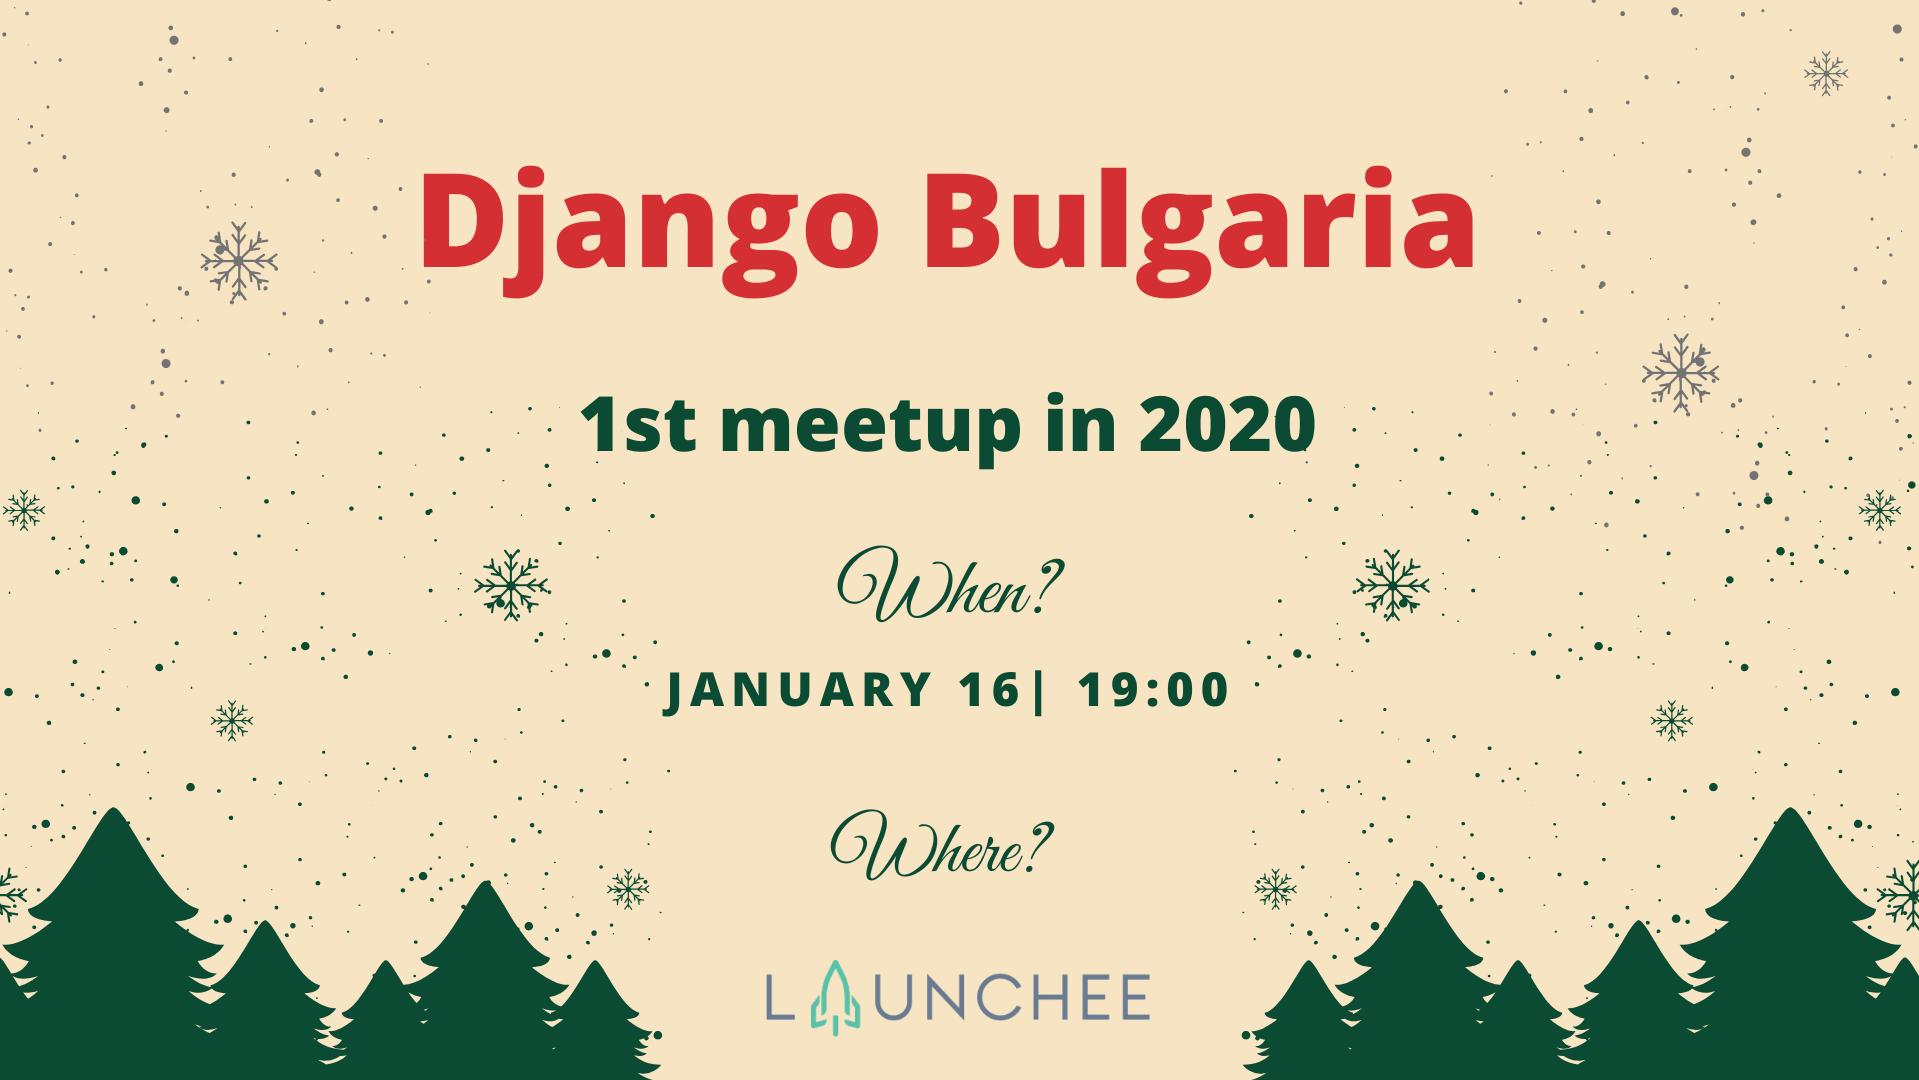 Django Bulgaria